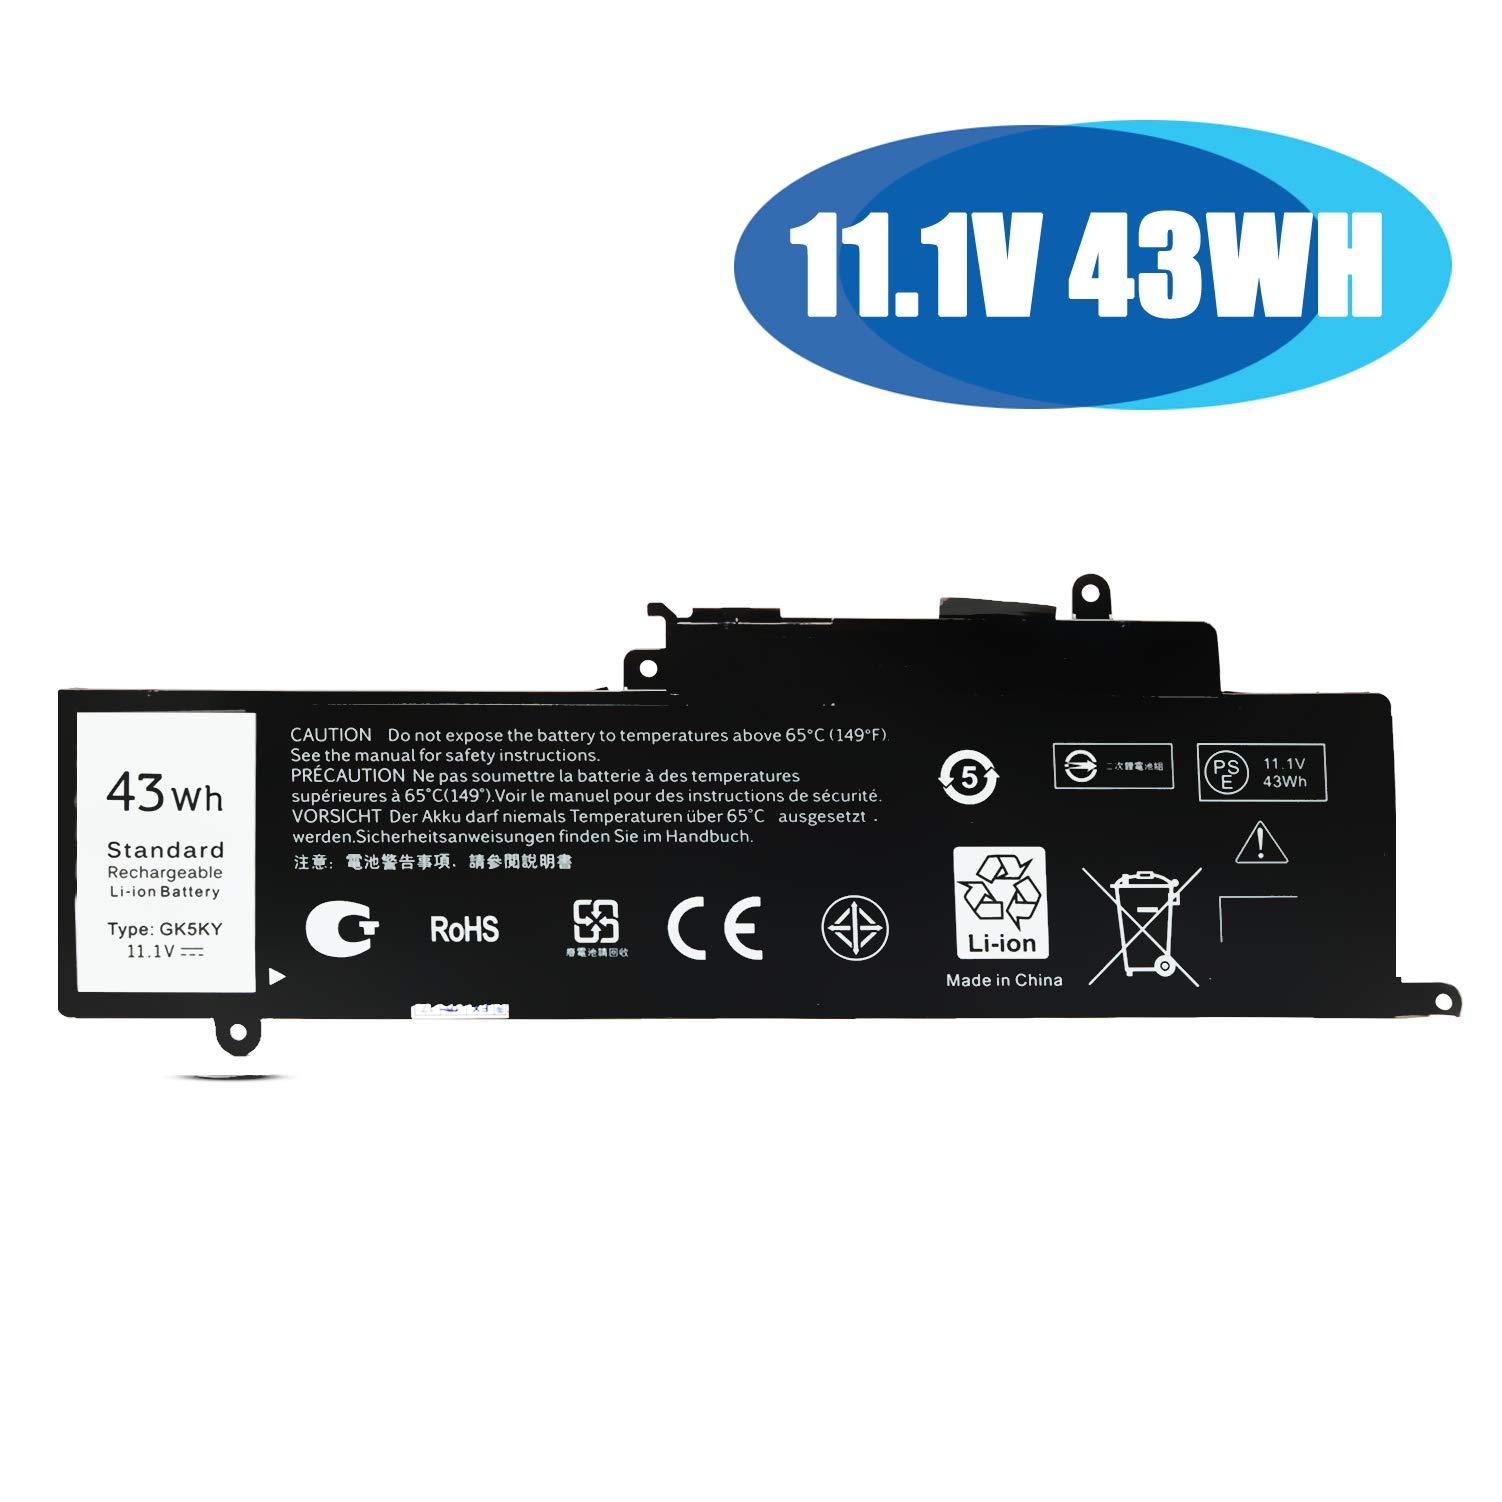 Bateria 4k8yh Gk5ky Para Dell Inspiron 11 3147/11 3152/13 7000/13 7347/13 7359/13 7352/13 7558 Series P/n:92nct 092nct 0